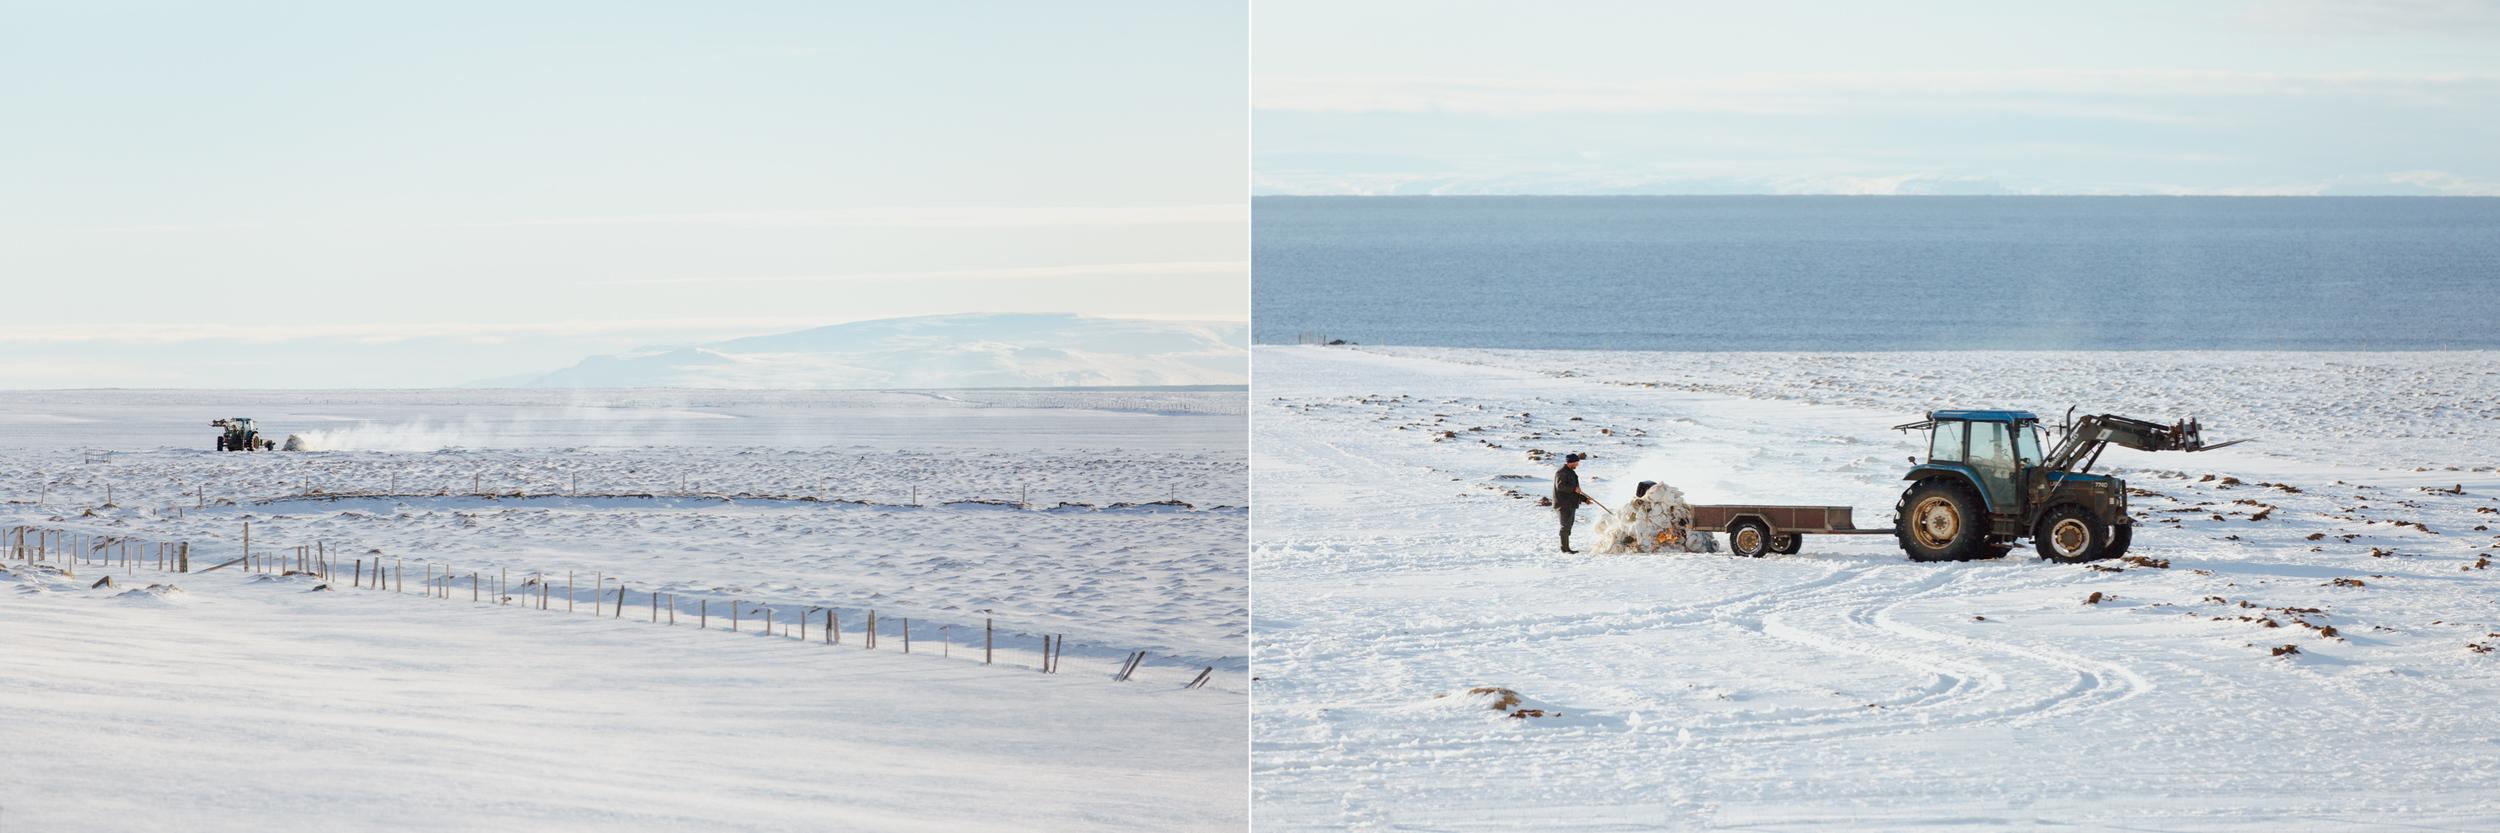 MikeSeehagel-Iceland-Photography-Blog-01.jpg